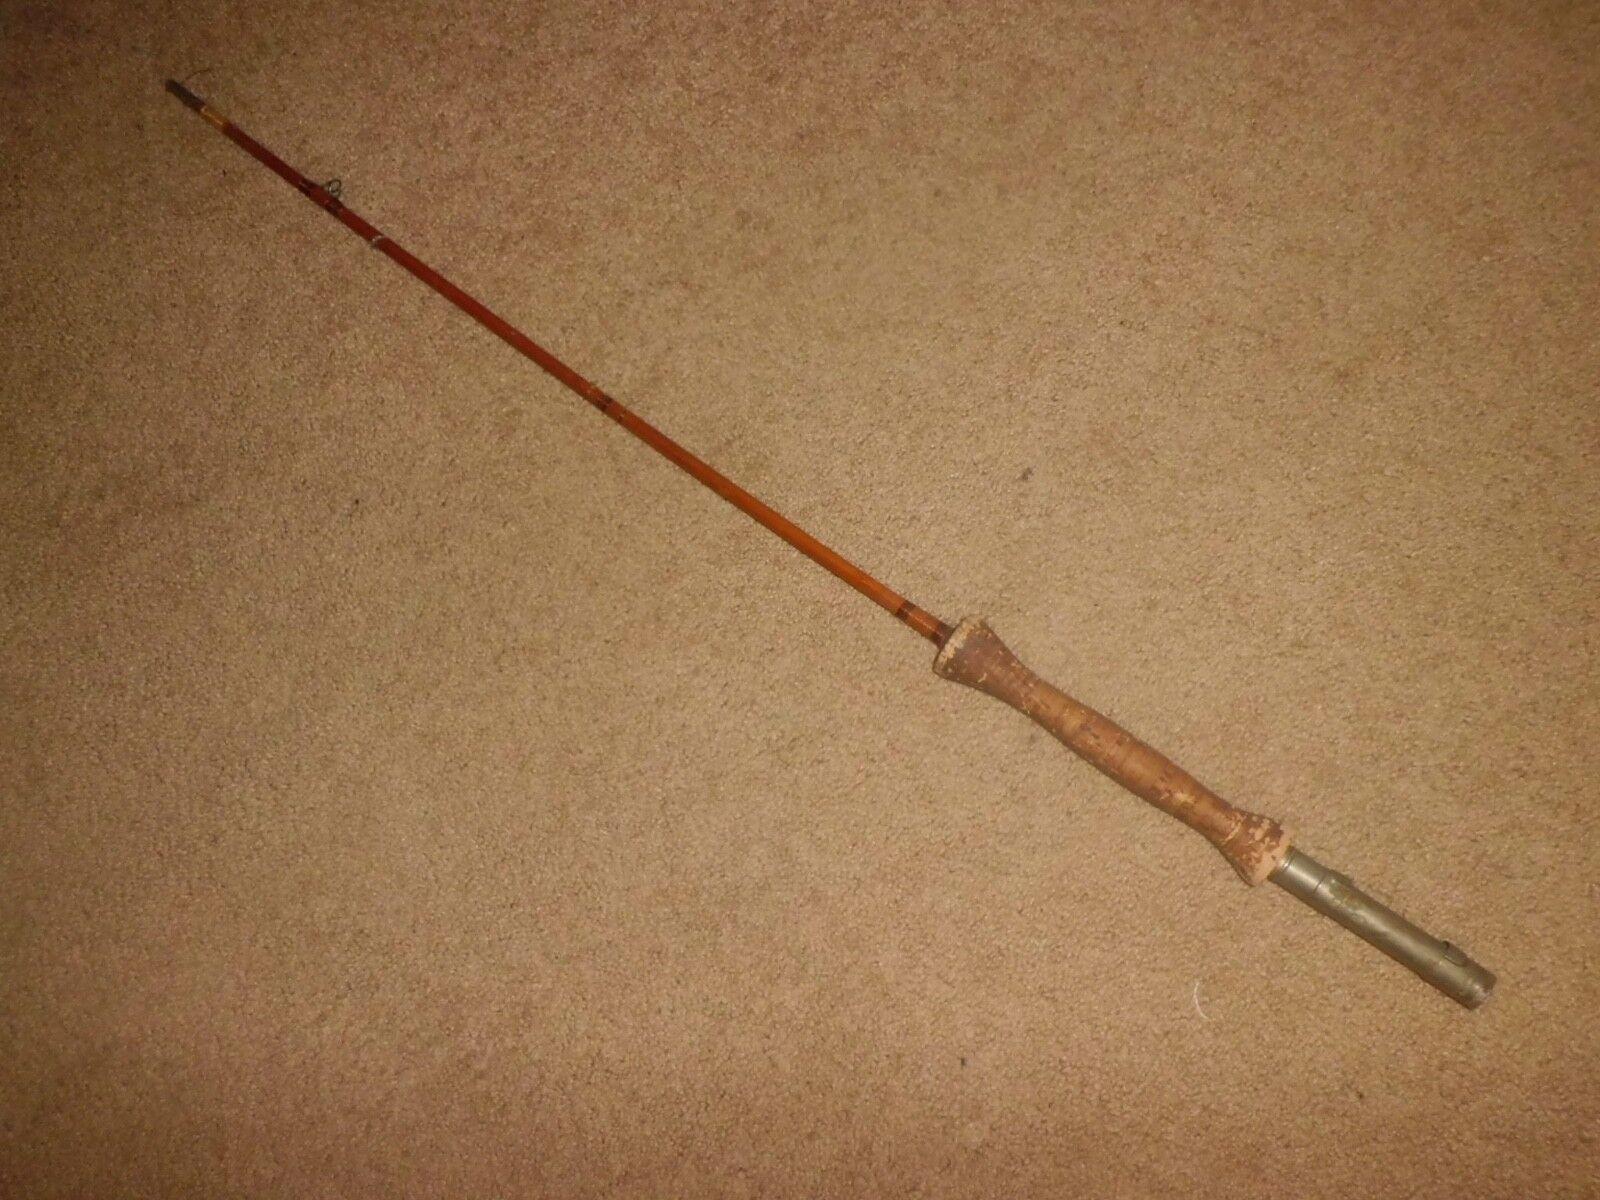 Vintage 38-1 2  Butt Section w  Beaty Reel Seat Split Bamboo Fly Rod- USA